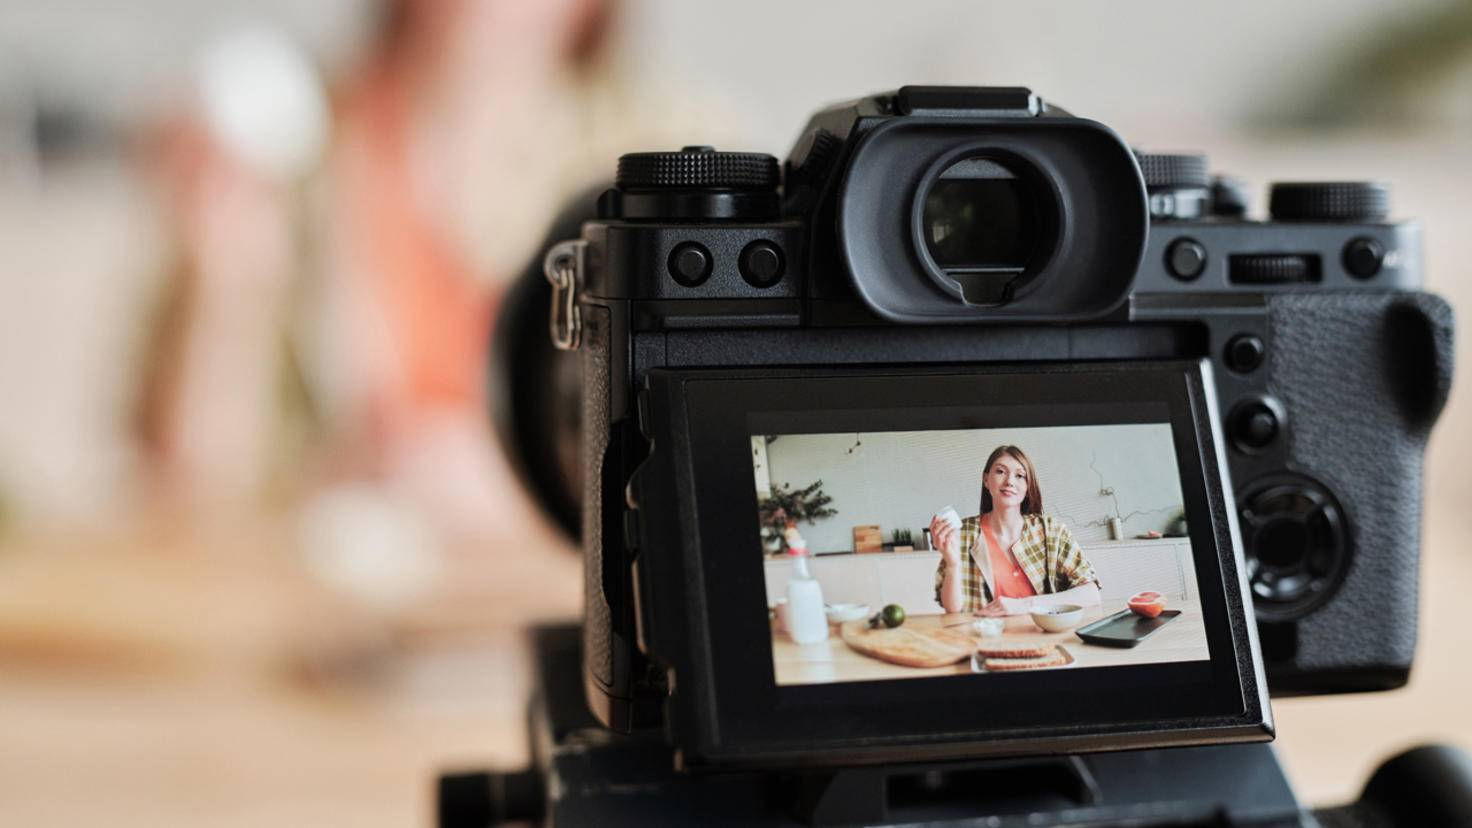 vlog-equipment-ausruestung-vlogger-zubehoer-kamera